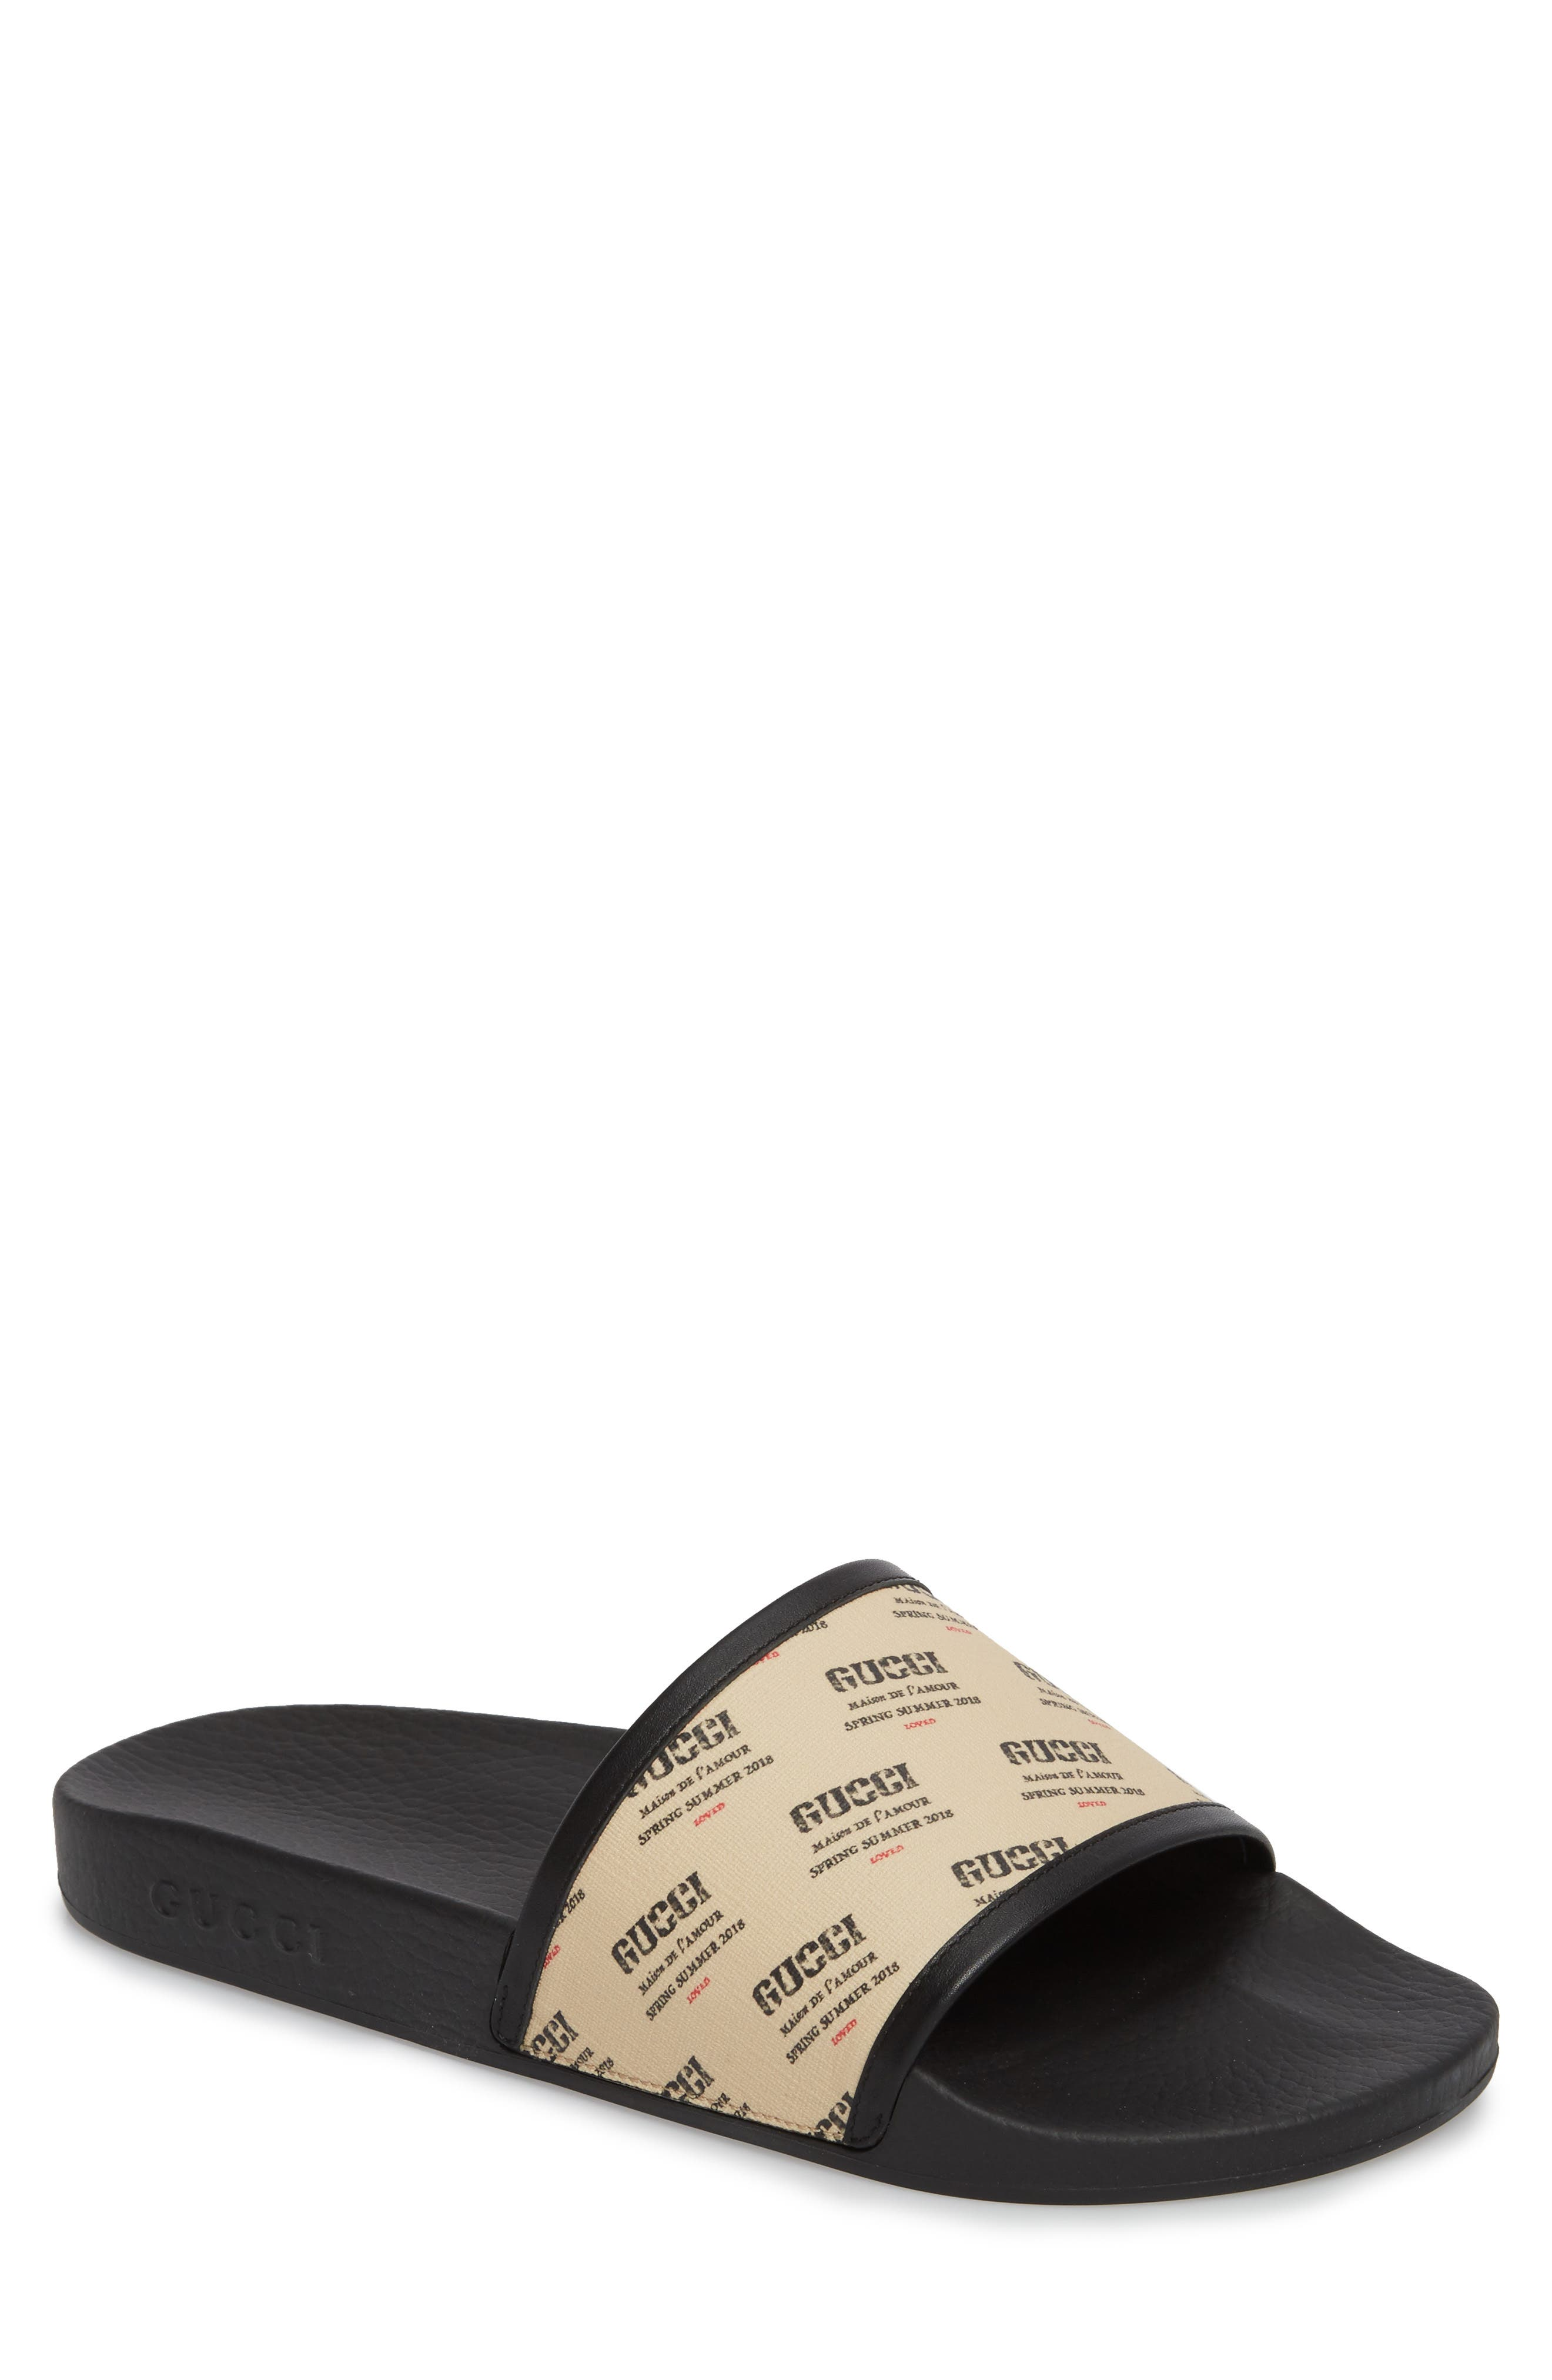 Invite Slide Sandal,                         Main,                         color, Black Patino